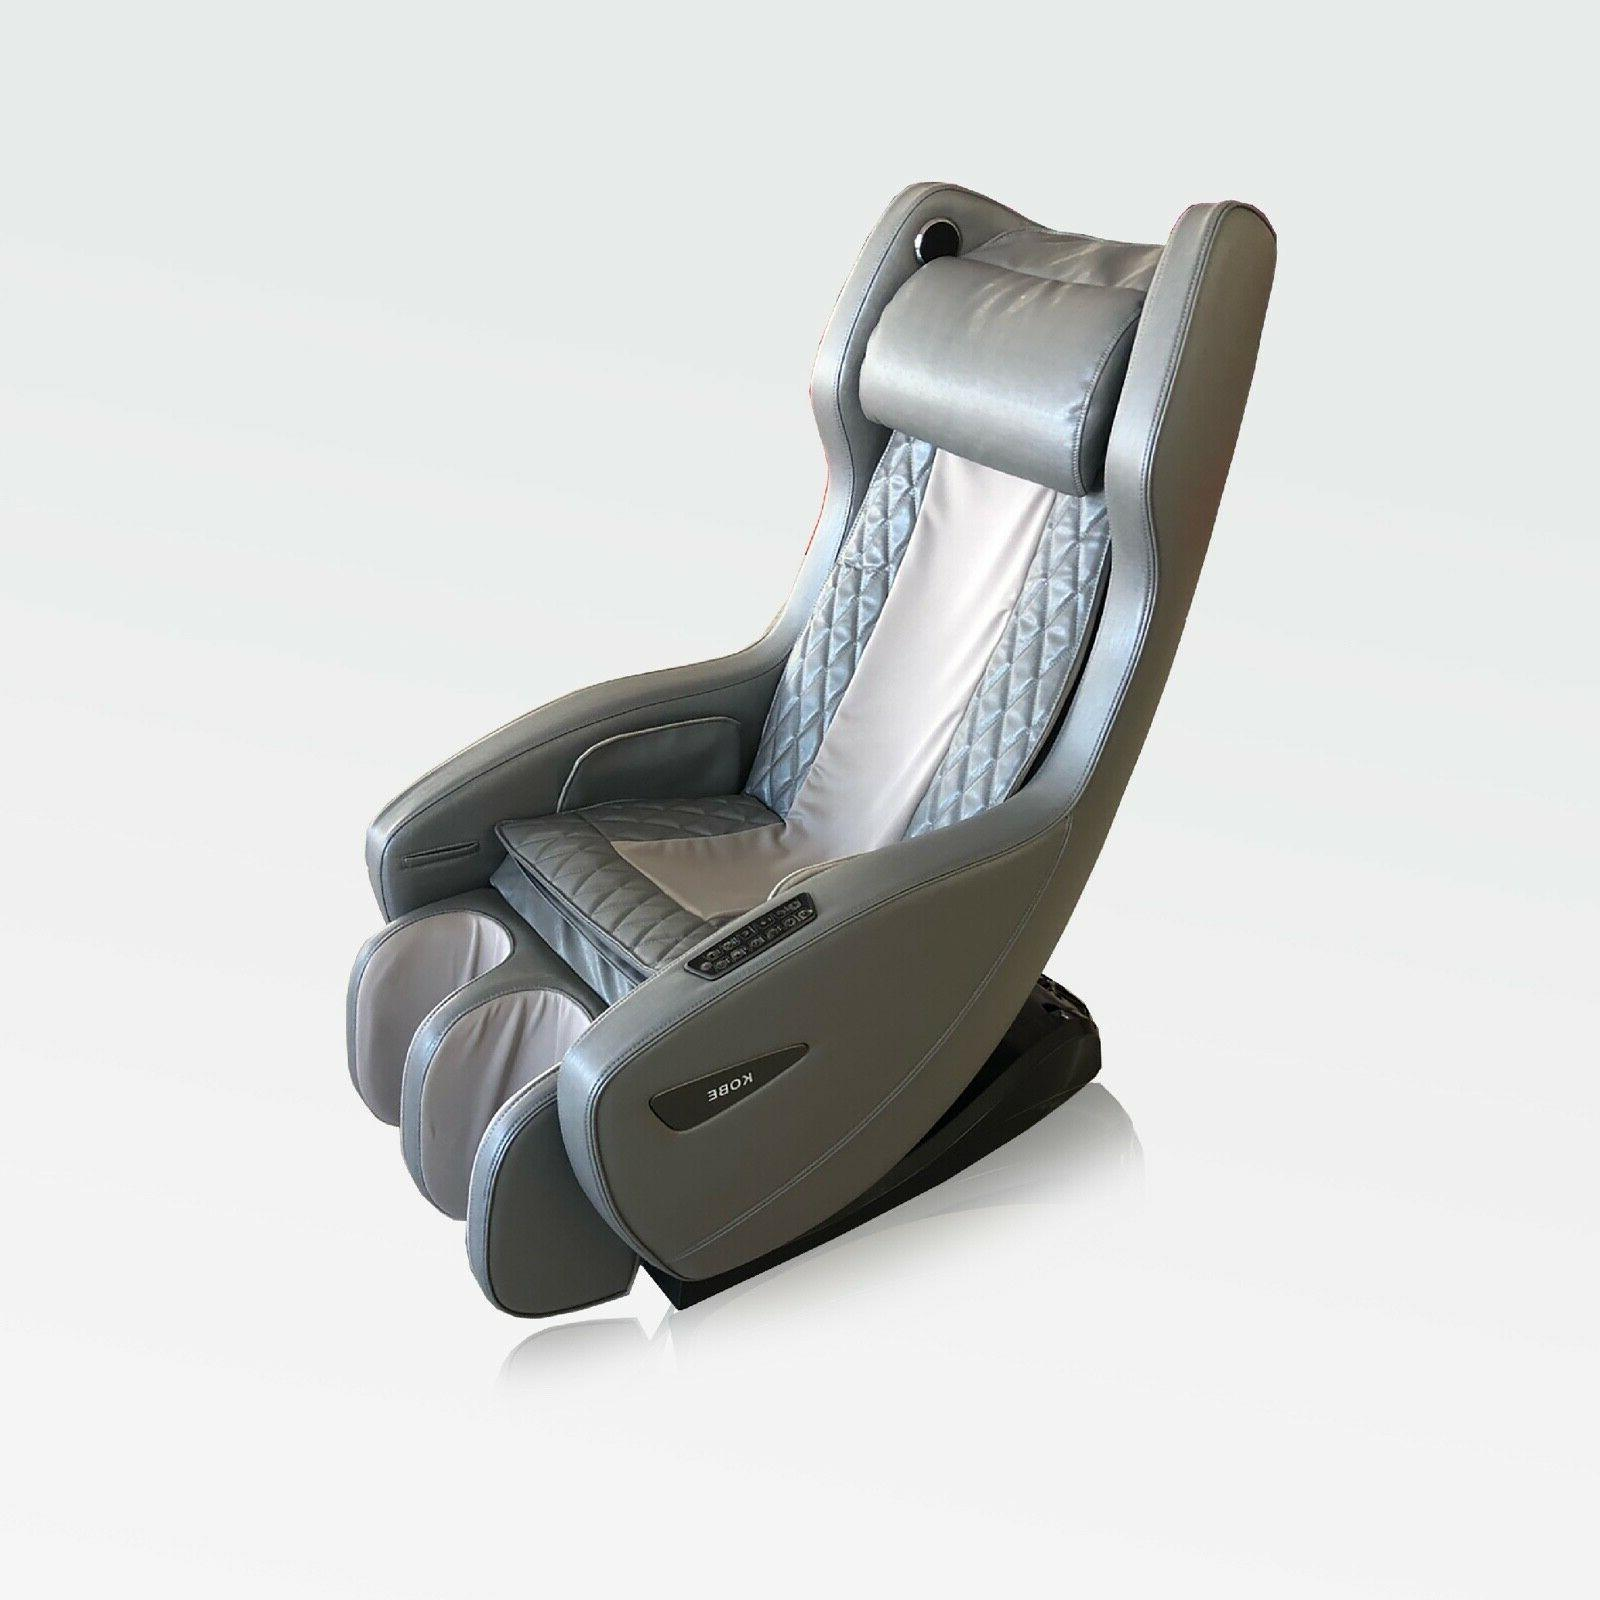 New Kobe Body Recliner Foot Rest